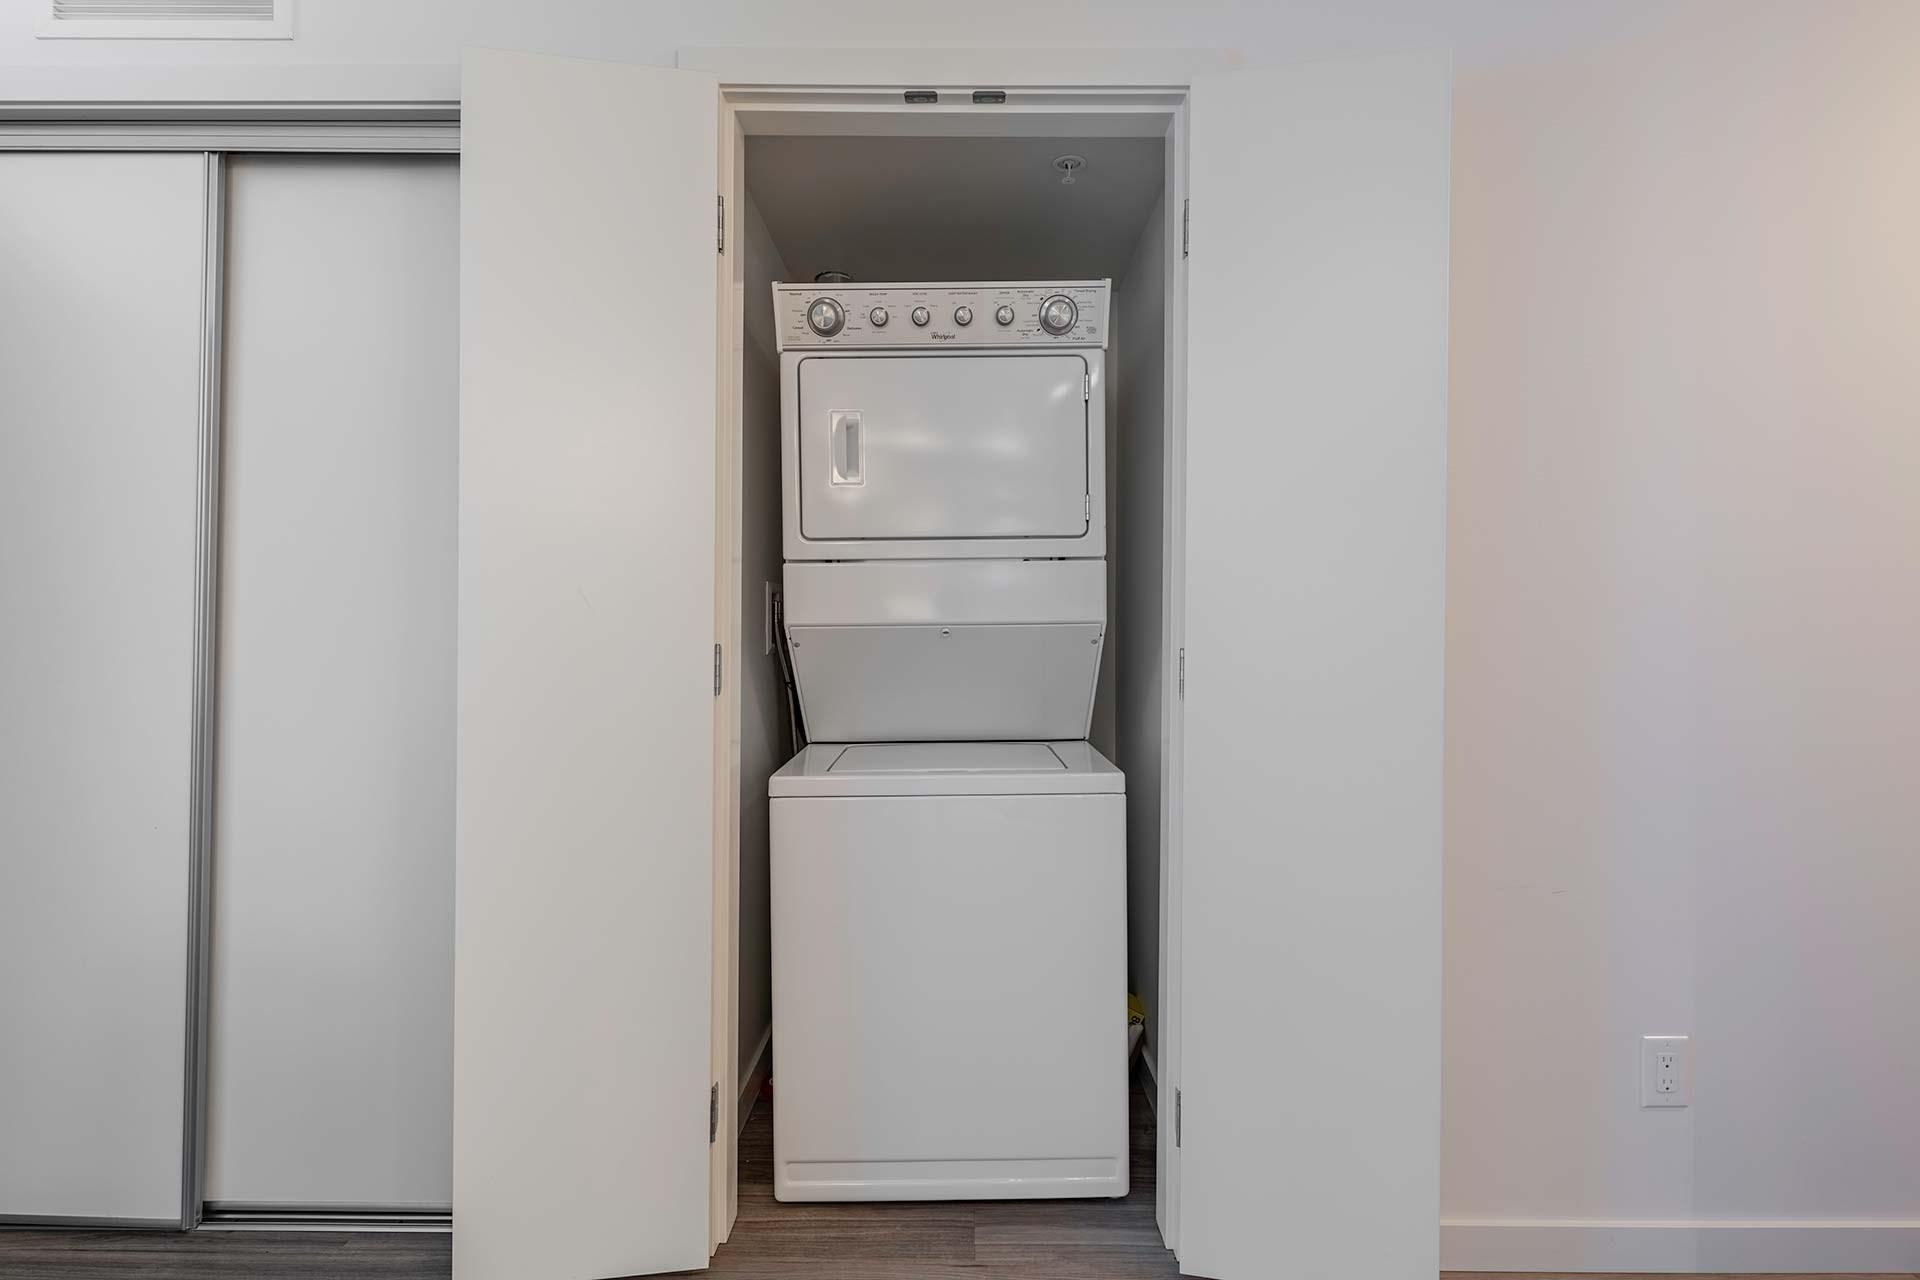 775-academy-way-u-three-ubco-kelowna-investment-property-laundry.Jpg